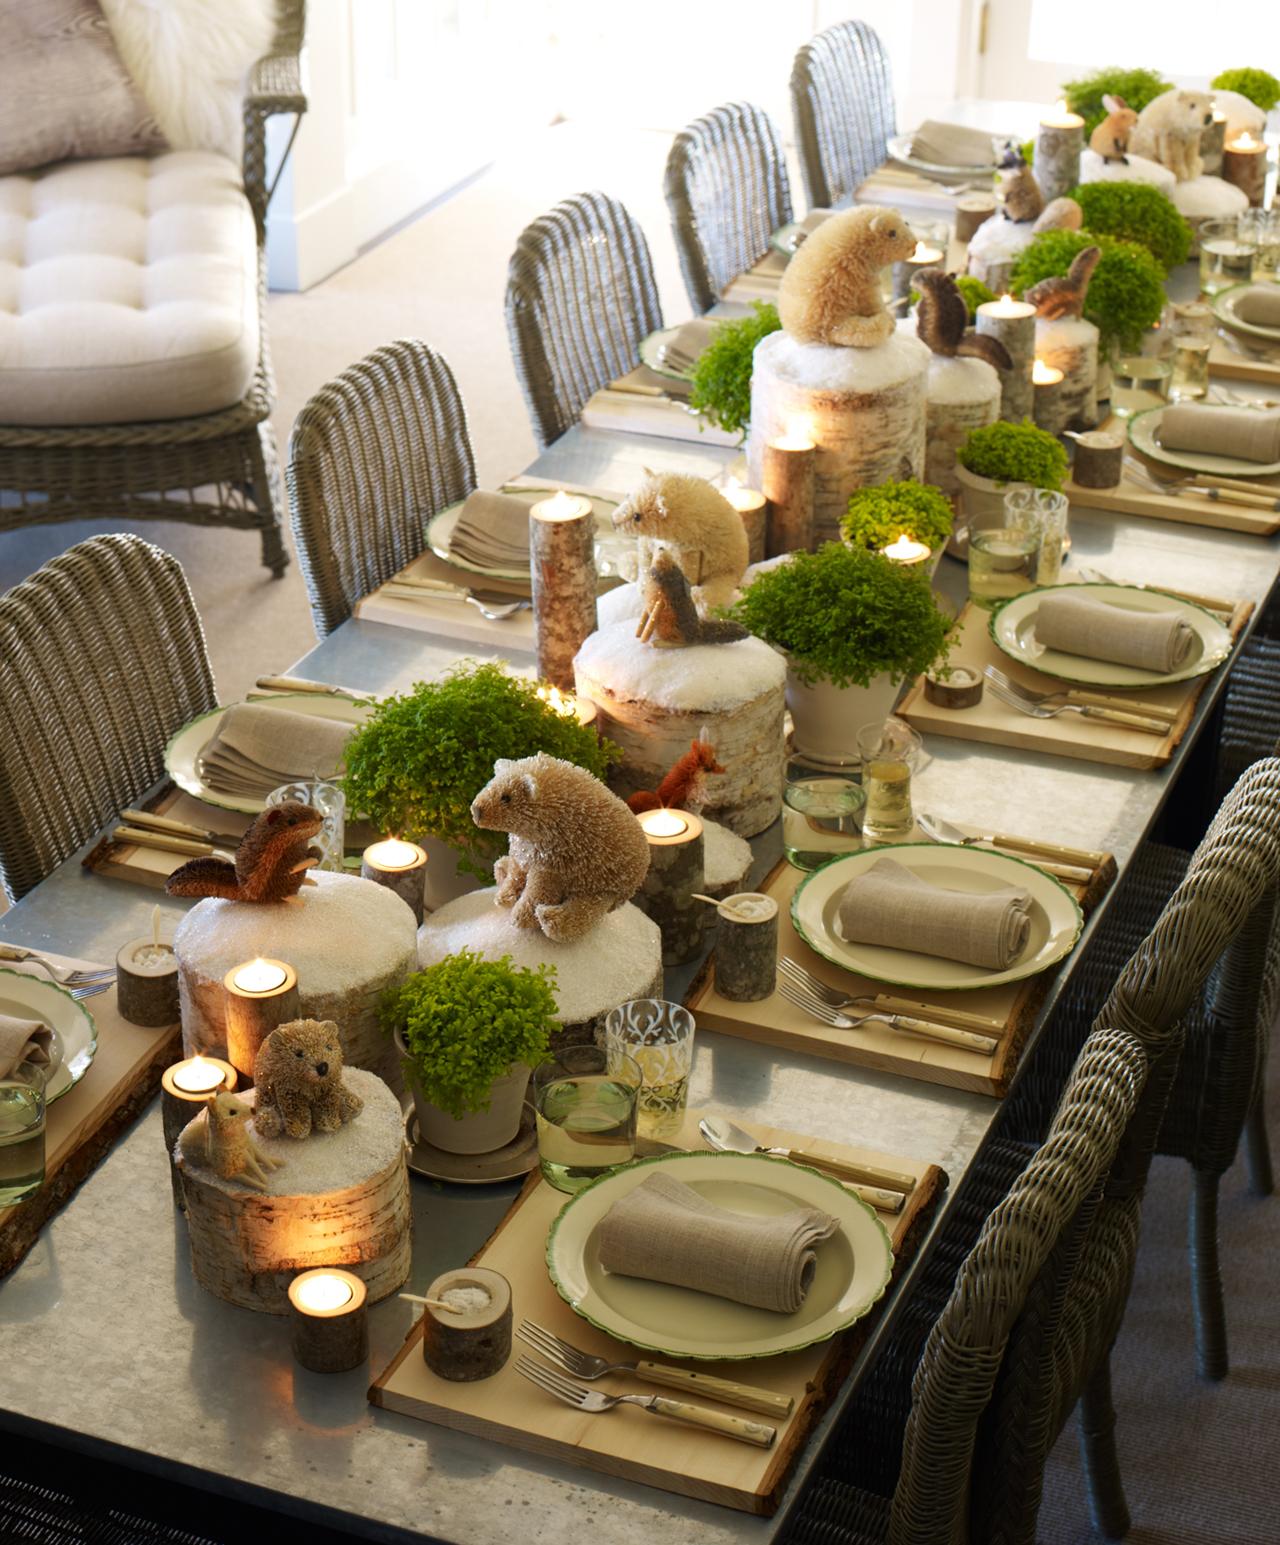 Diy christmas table decorations ideas - 39 Arctic And Urban Wonderland